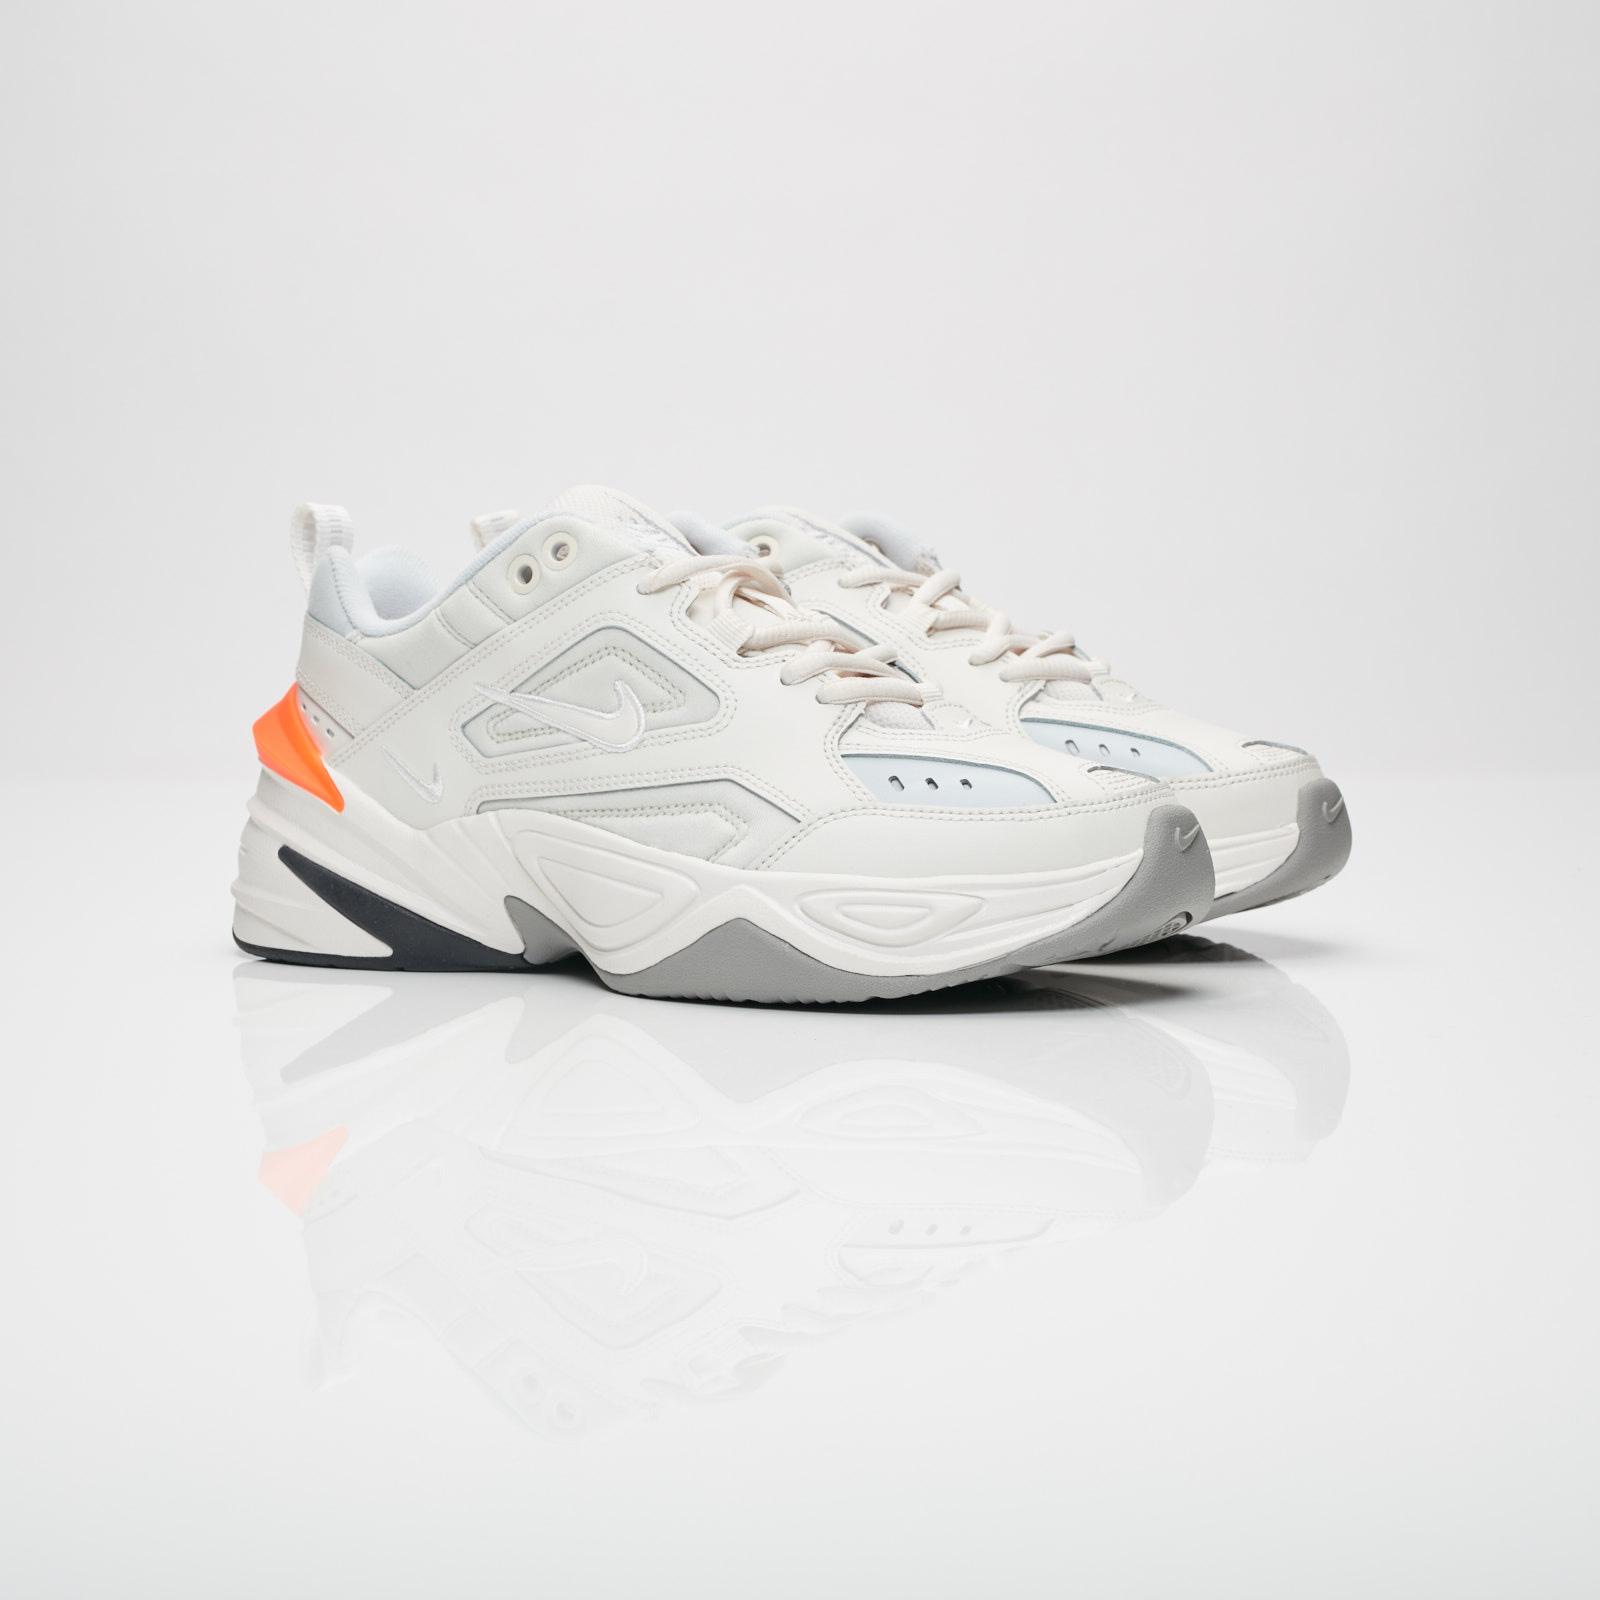 Nike Wmns M2K Tekno - Ao3108-001 - Sneakersnstuff   sneakers